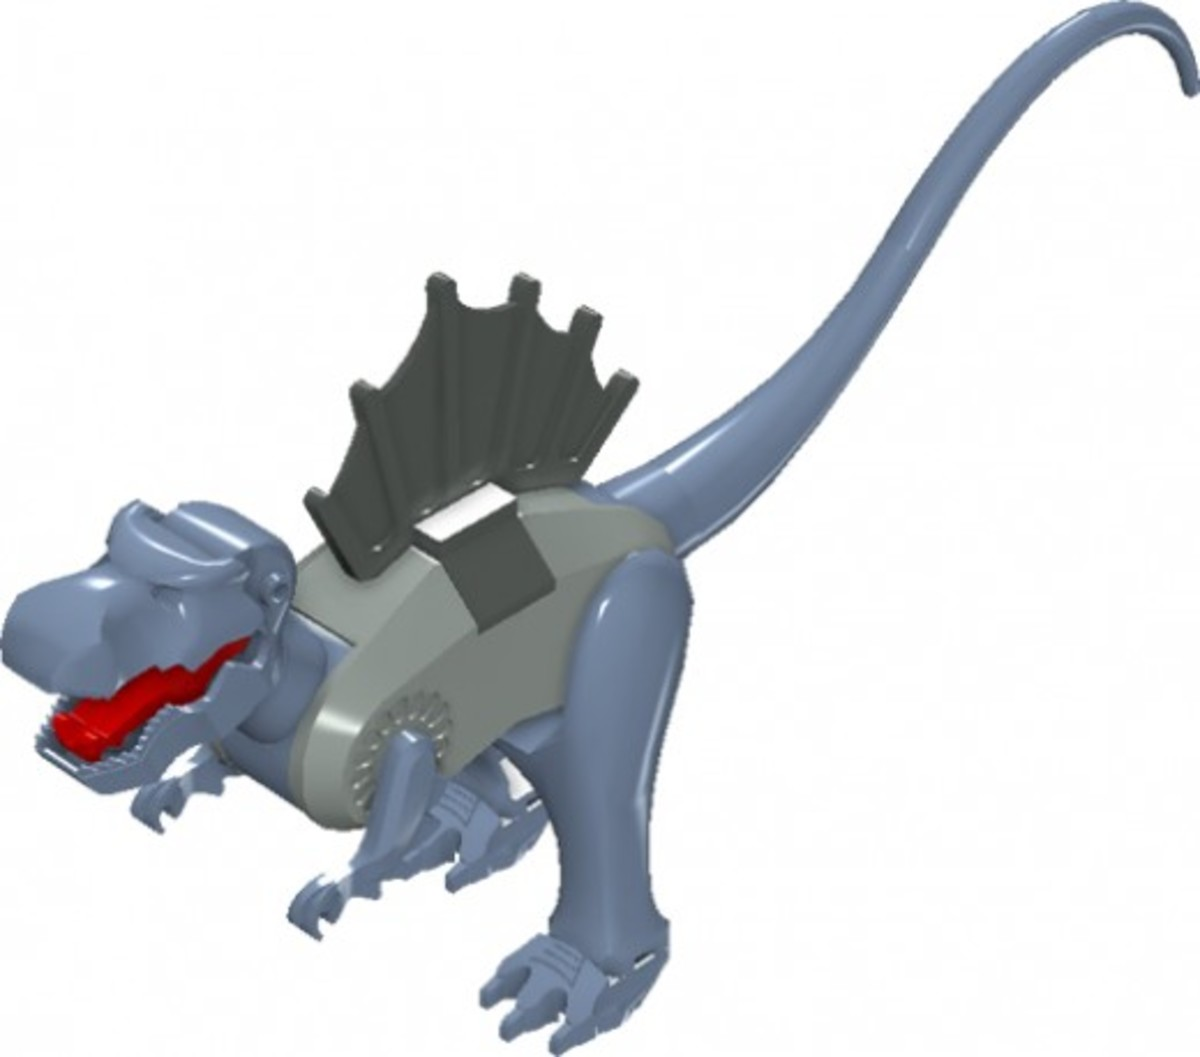 LEGO Dinosaurs Spinosaurus 6720 Assembled